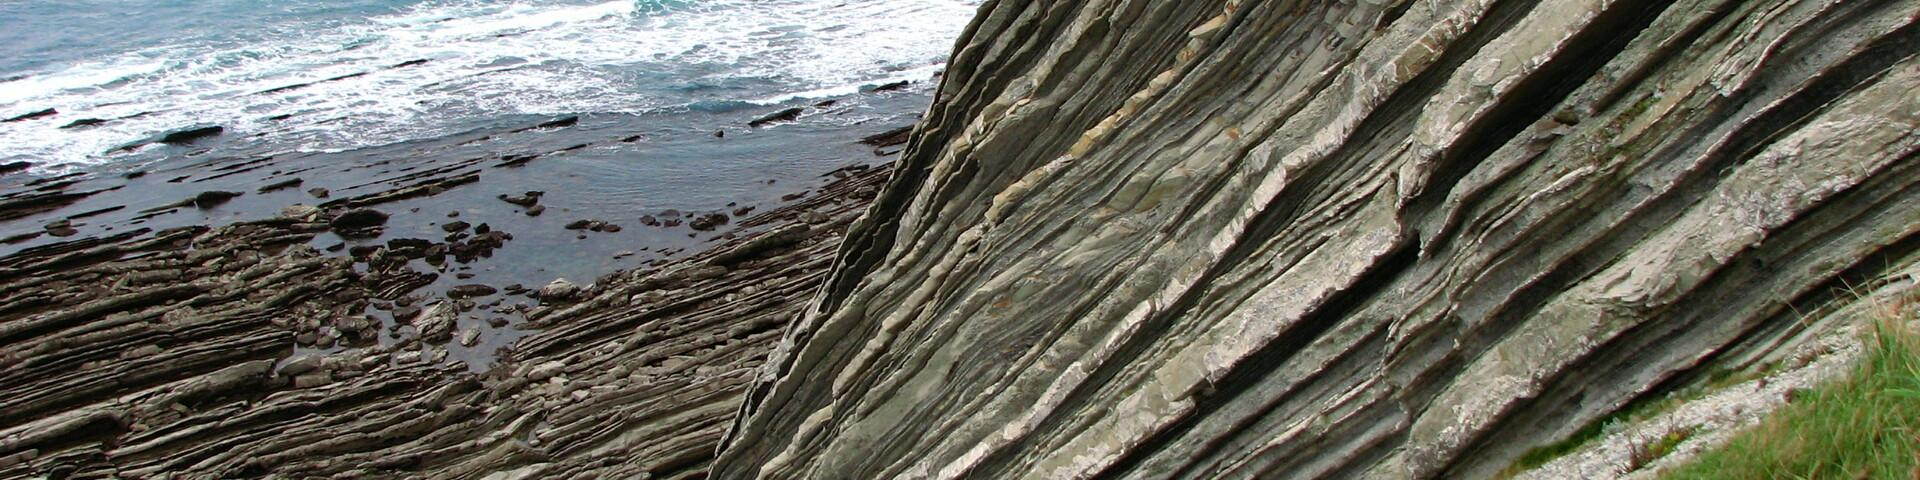 Alternances marno-calcaires, Pyrénées-Atlantiques